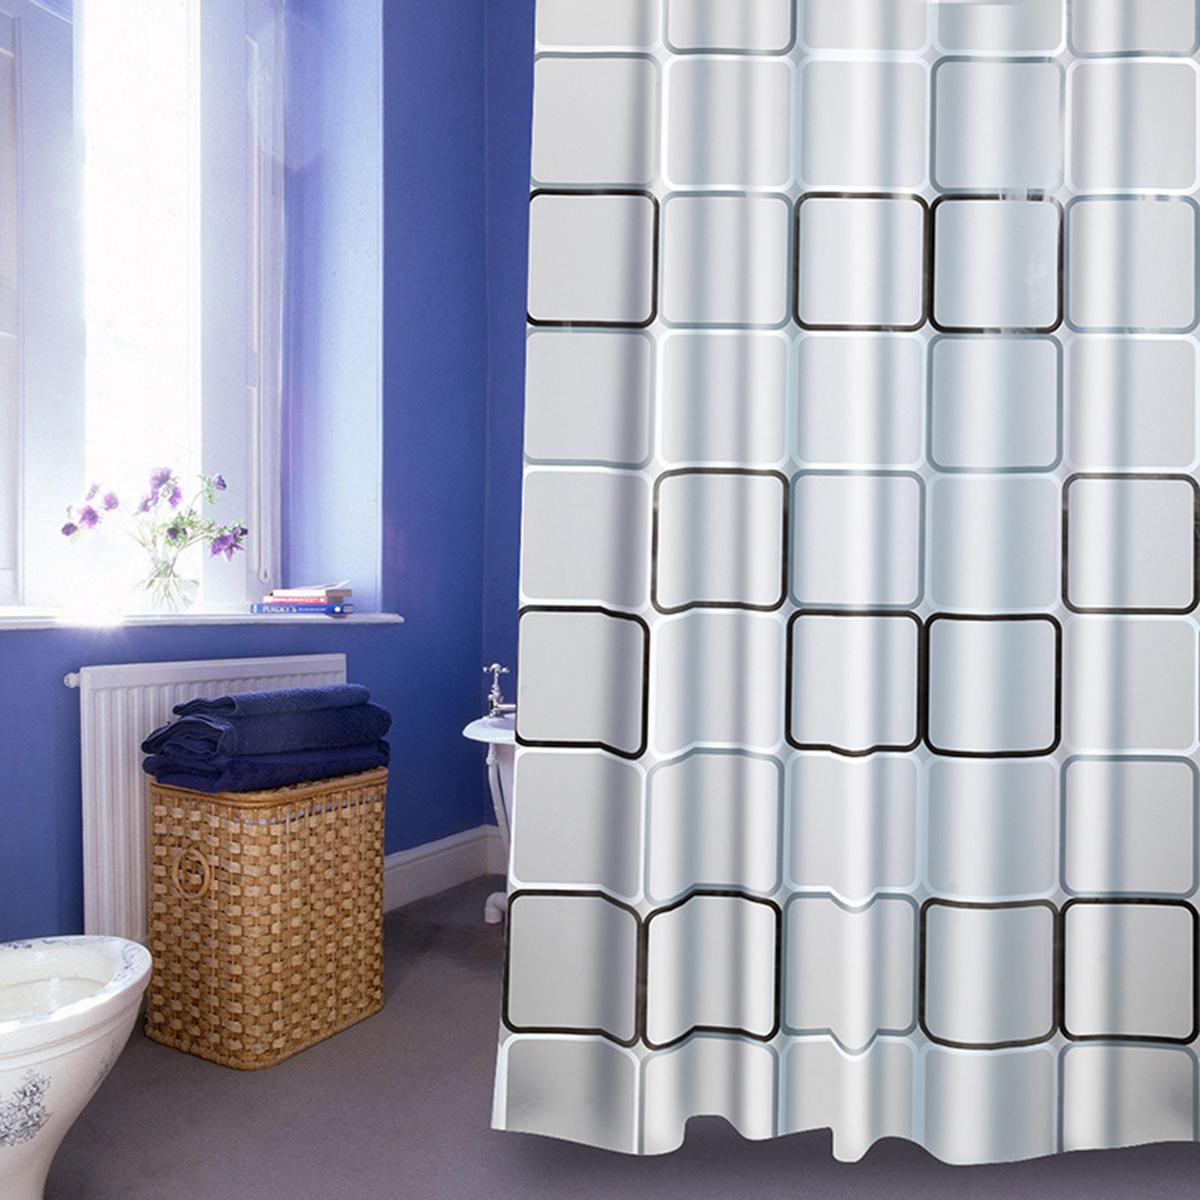 Details About 240cm Large Modern Waterproof Shower Curtain Polyethylene Bathroom Curtains Hook